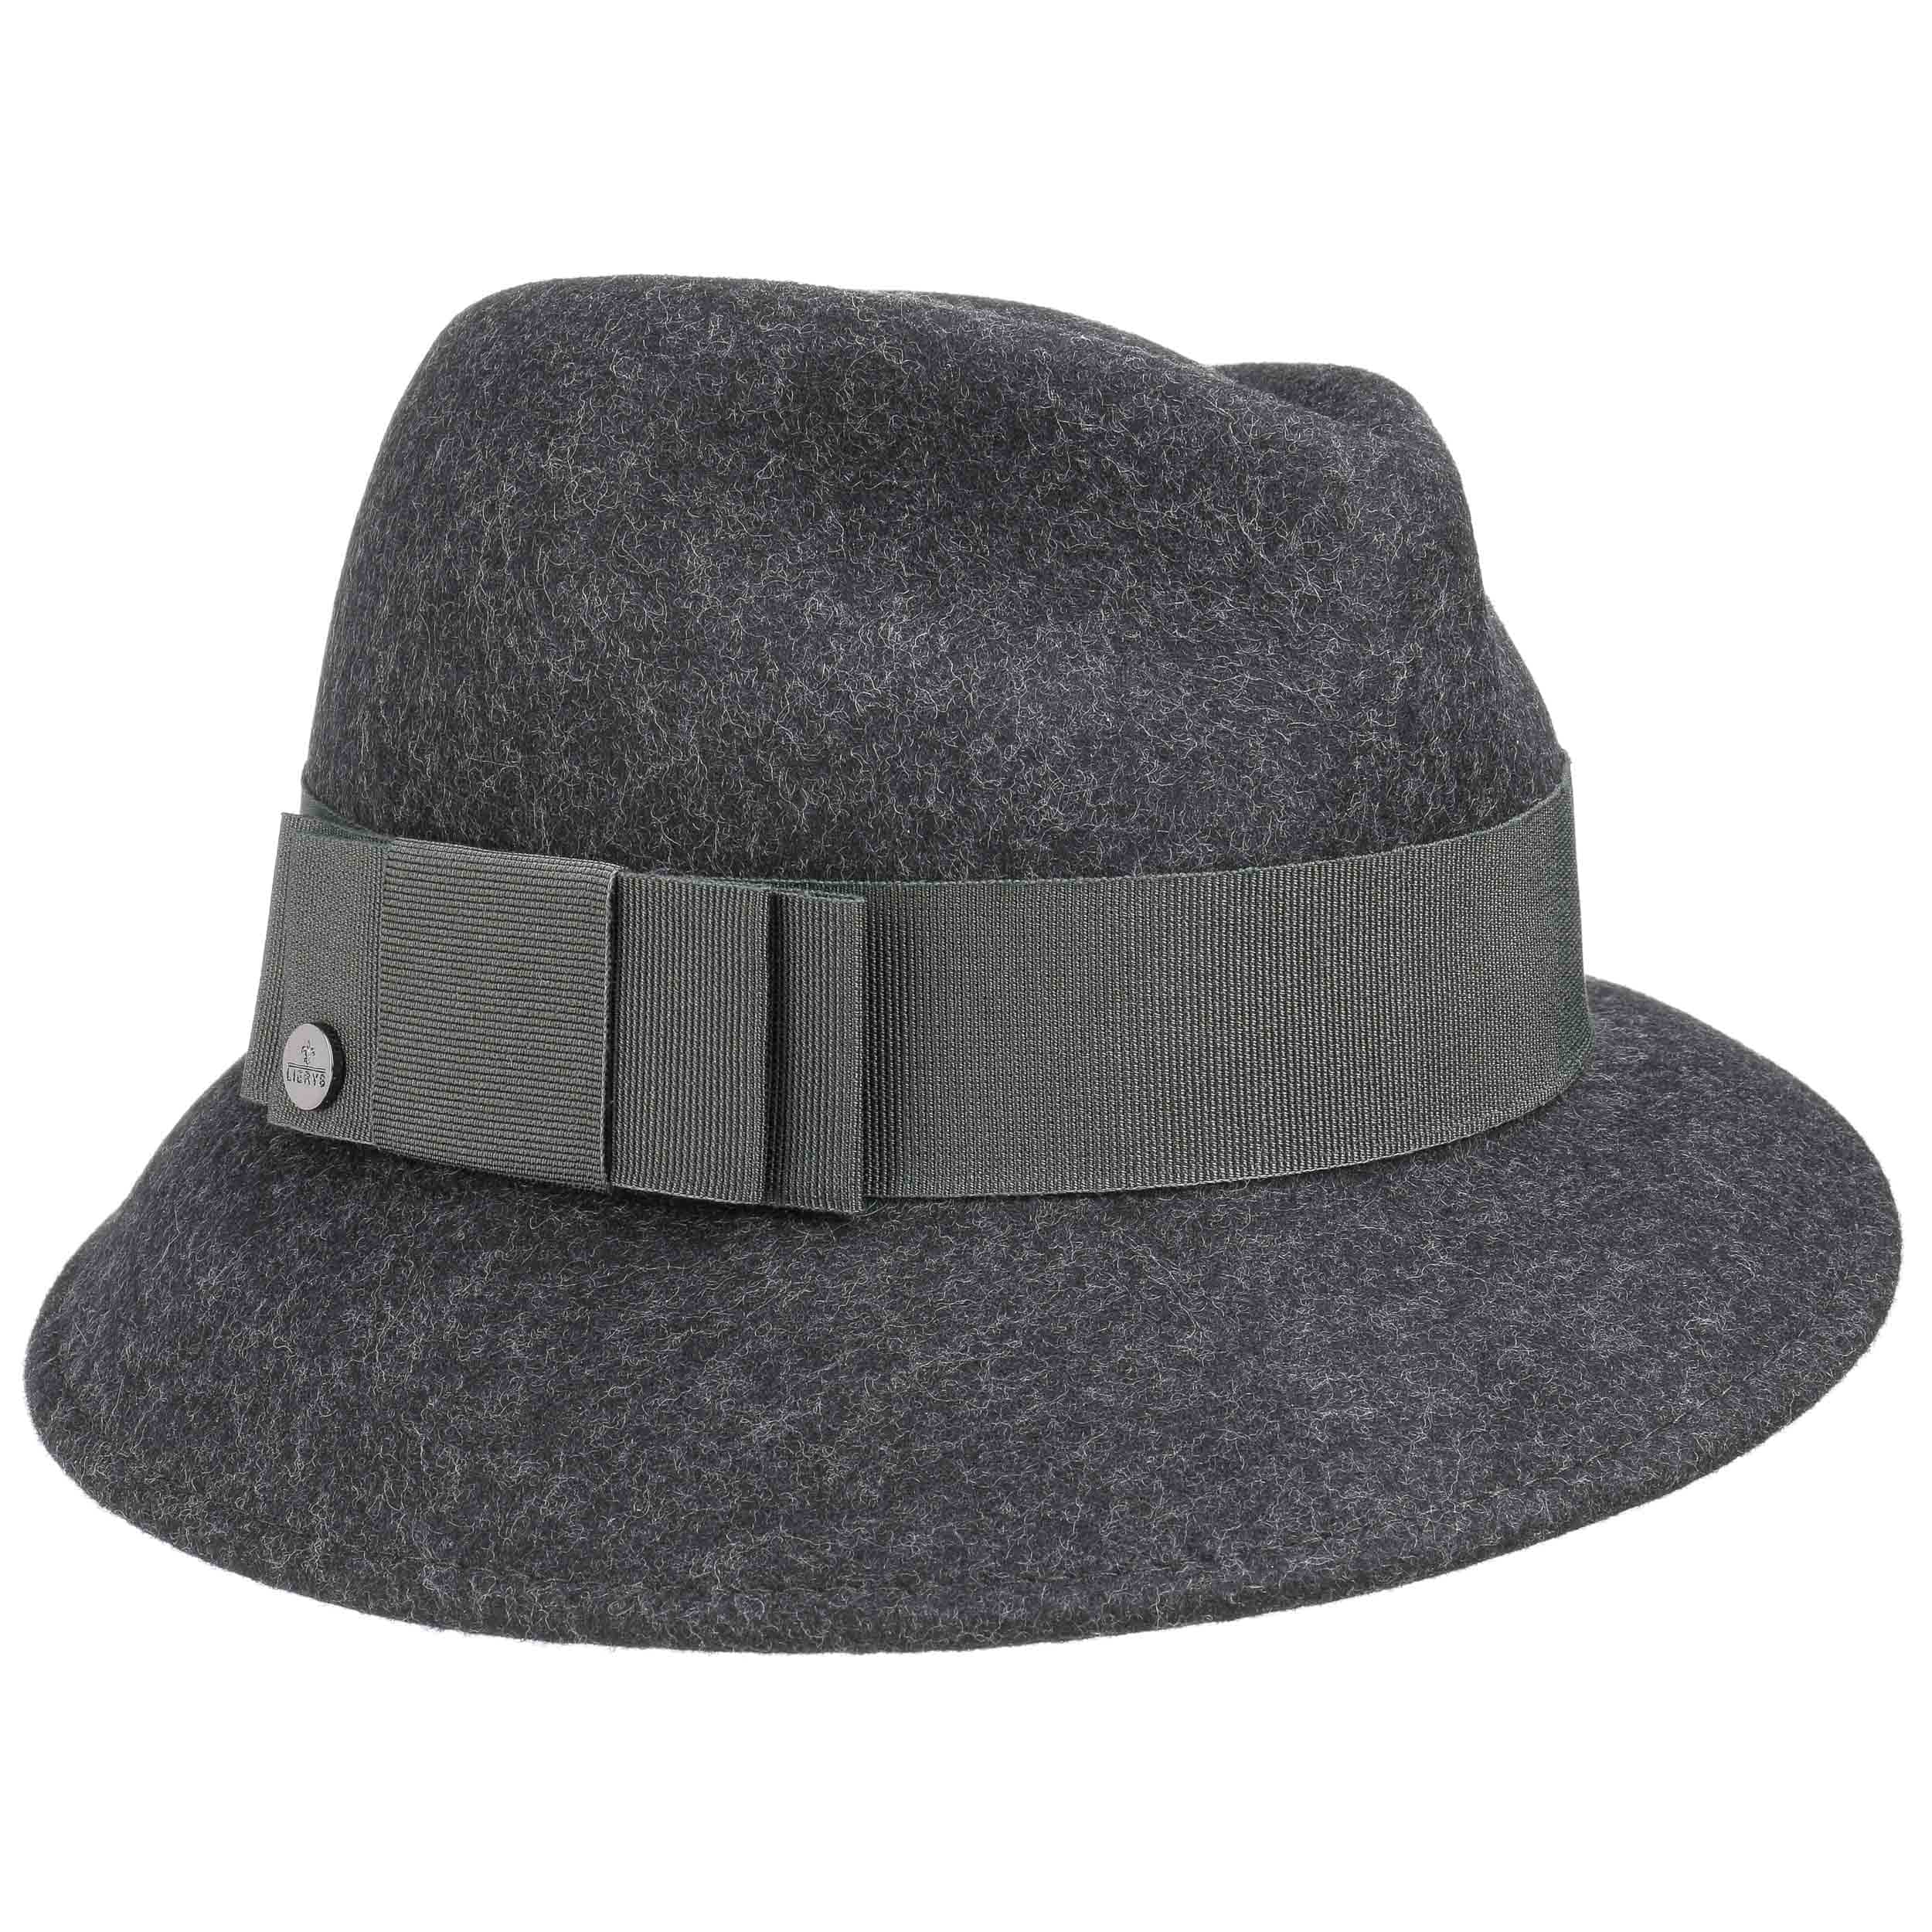 Asym Twotone Wool Felt Hat by Lierys Trilby hats Lierys FDyNjHBb